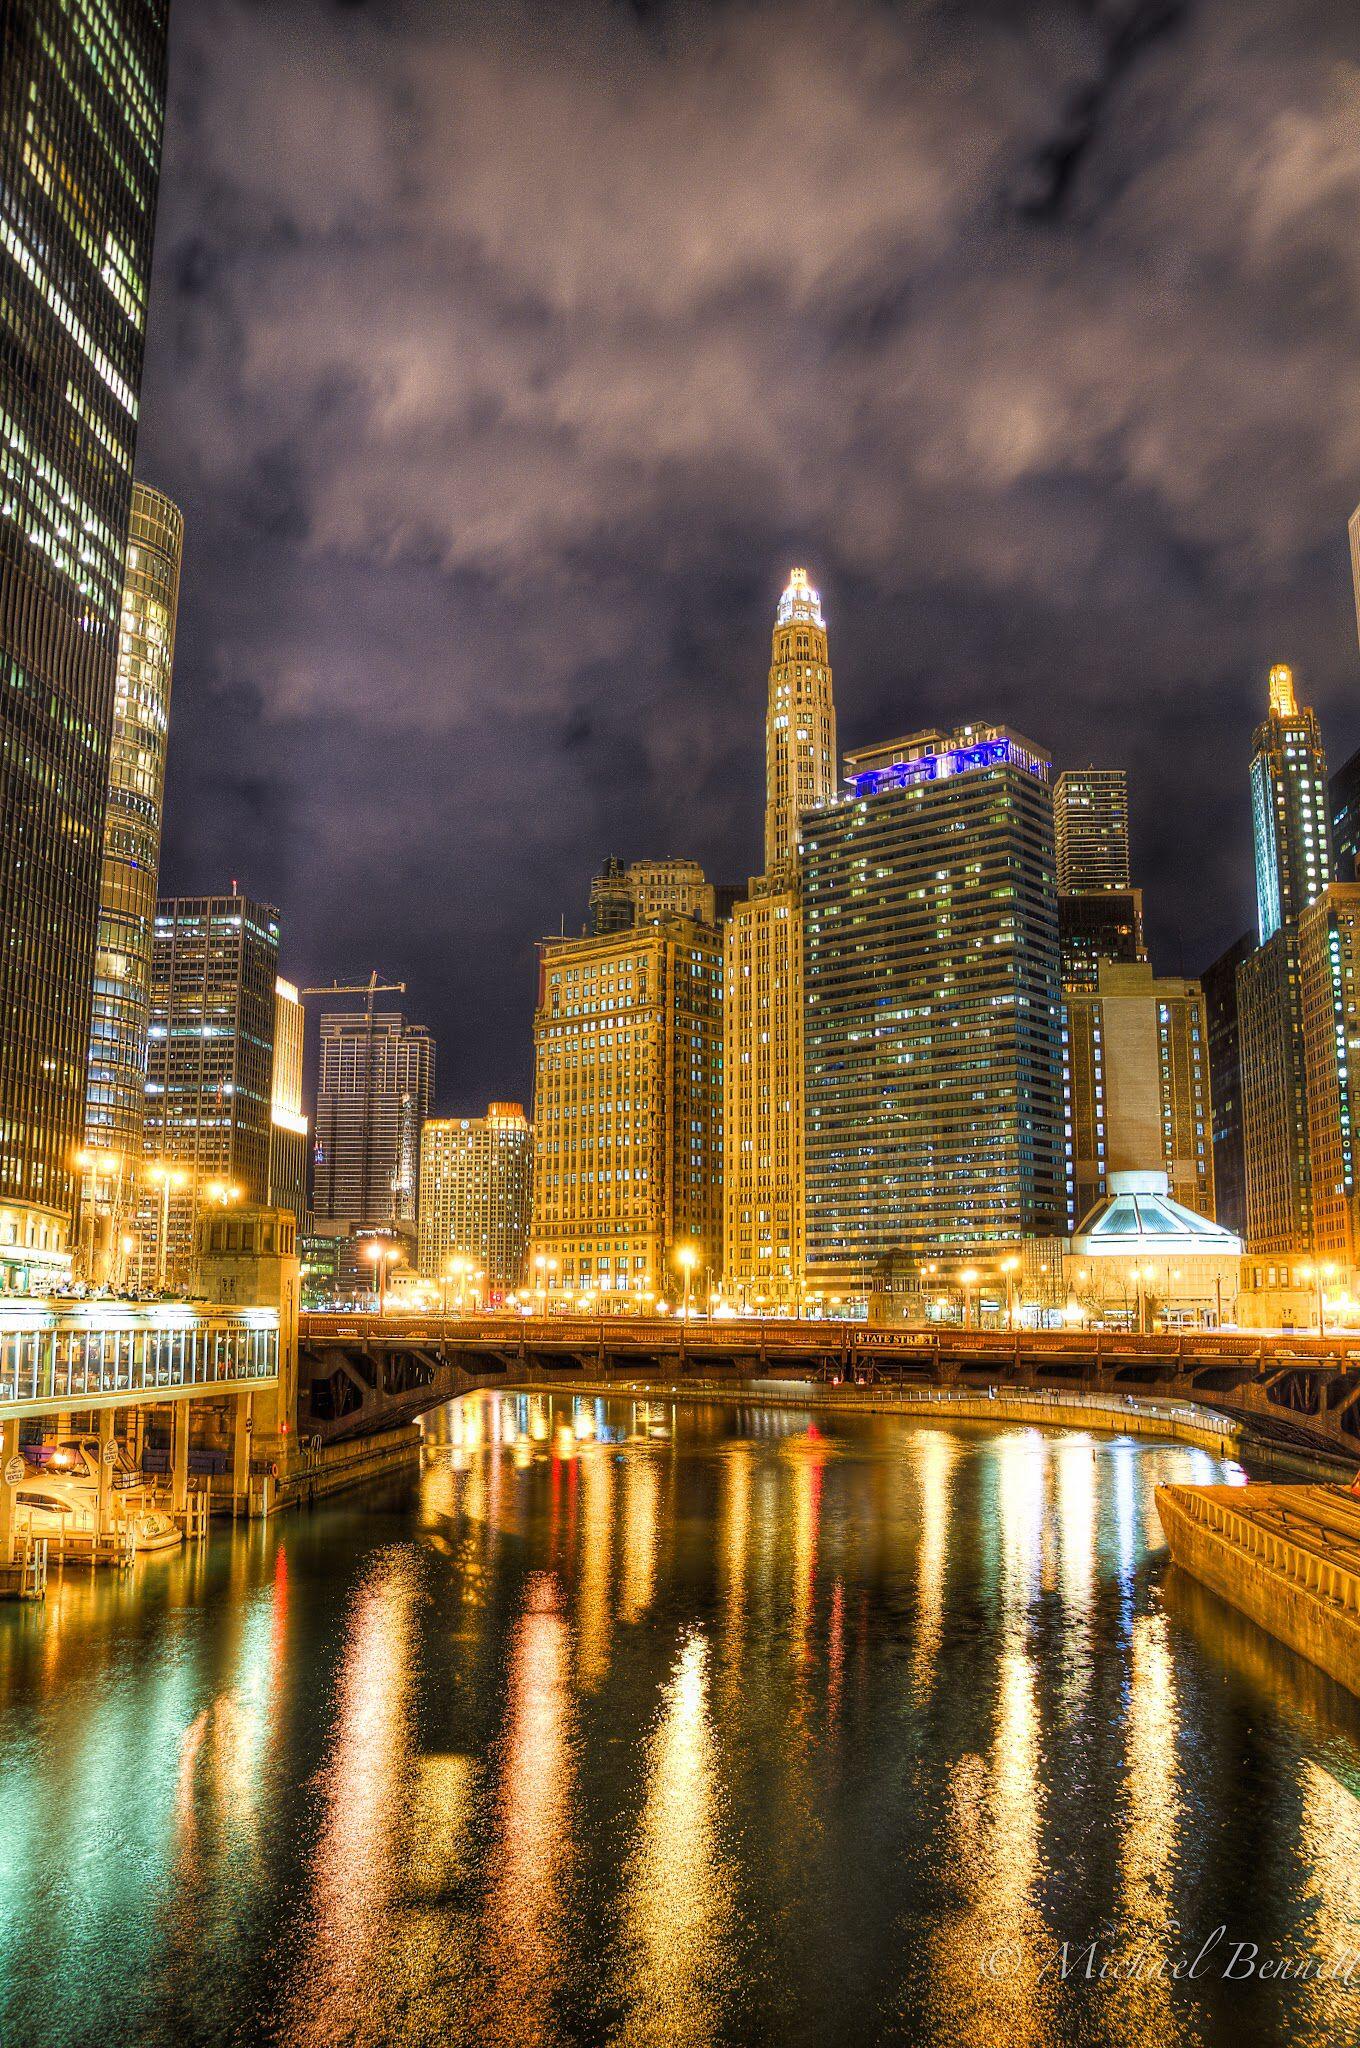 Chicago ️ (With images) | New york skyline, Travel around ...